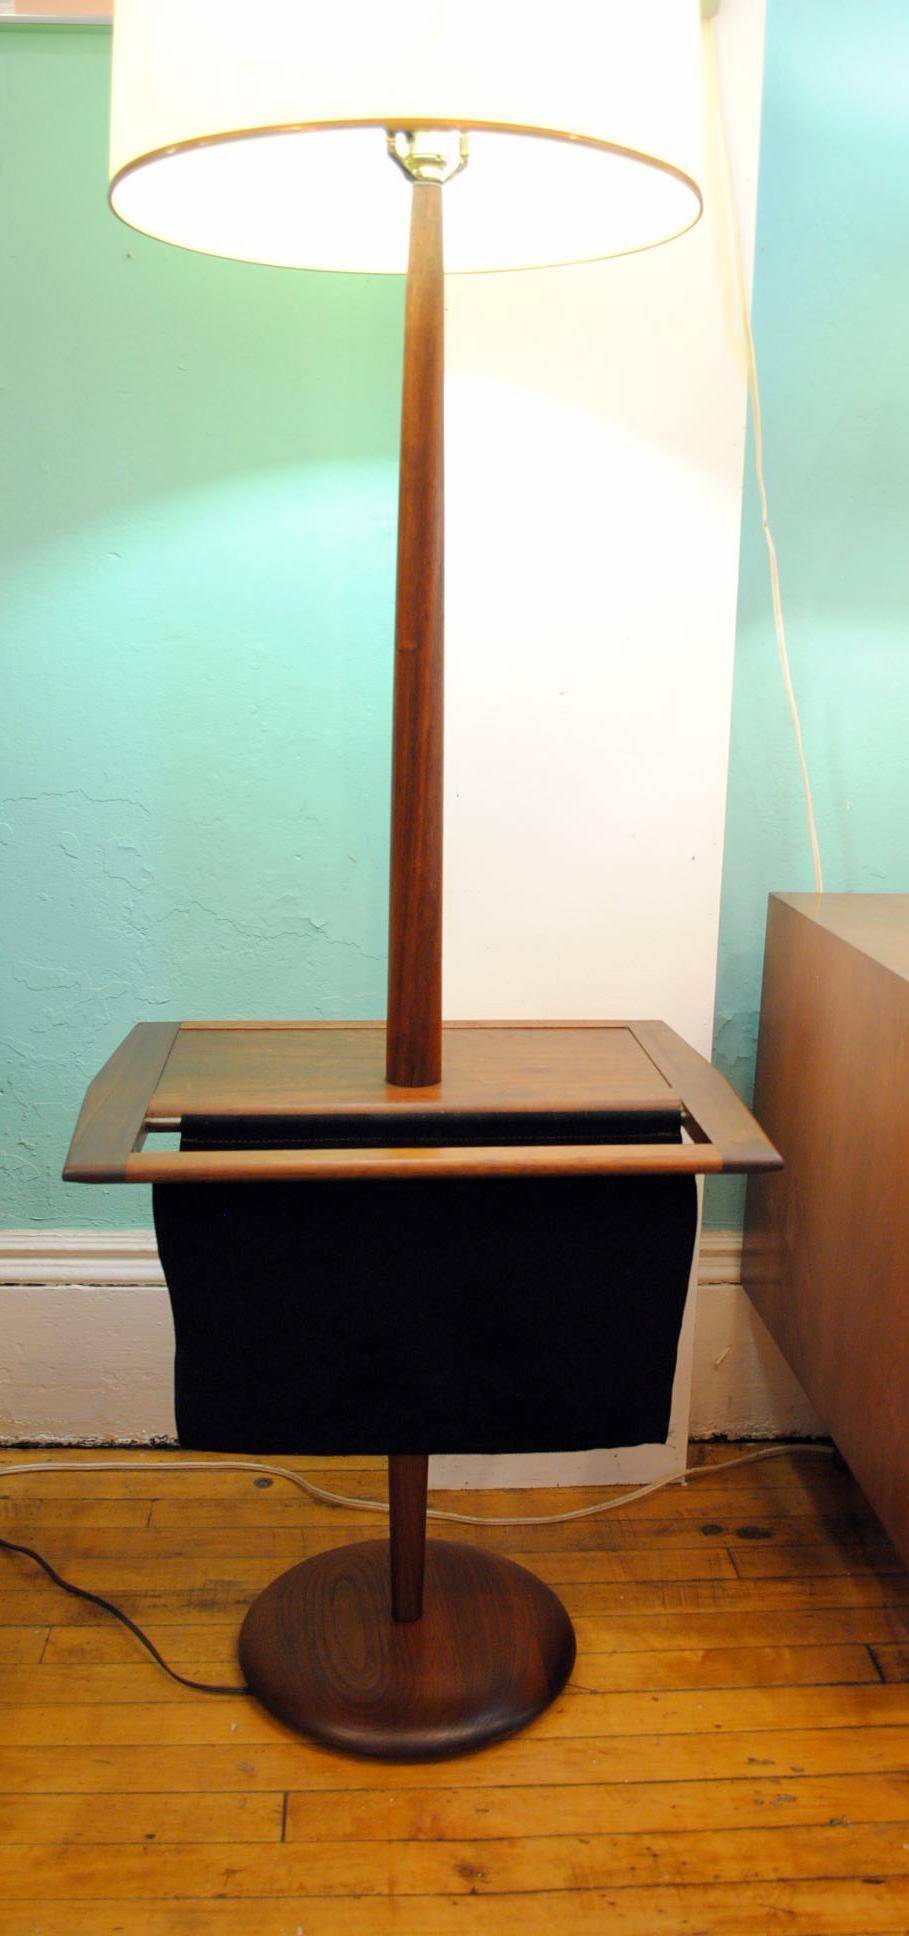 Laurel Mid Century Floor Lamp With Table U0026 Magazine Holder   Image 5 Of 10